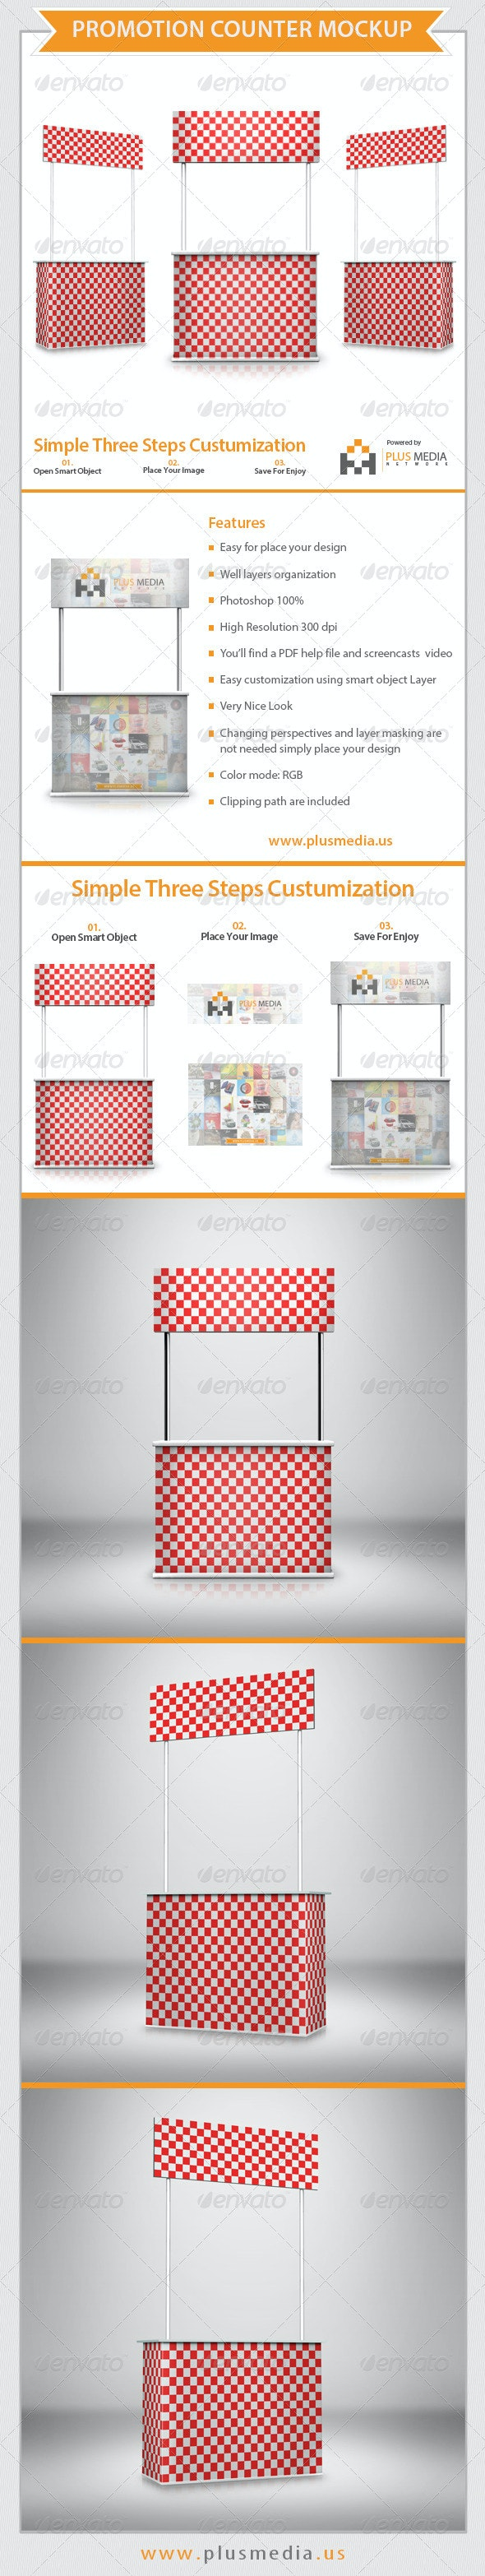 Promotion Counter Mockup - Print Product Mock-Ups